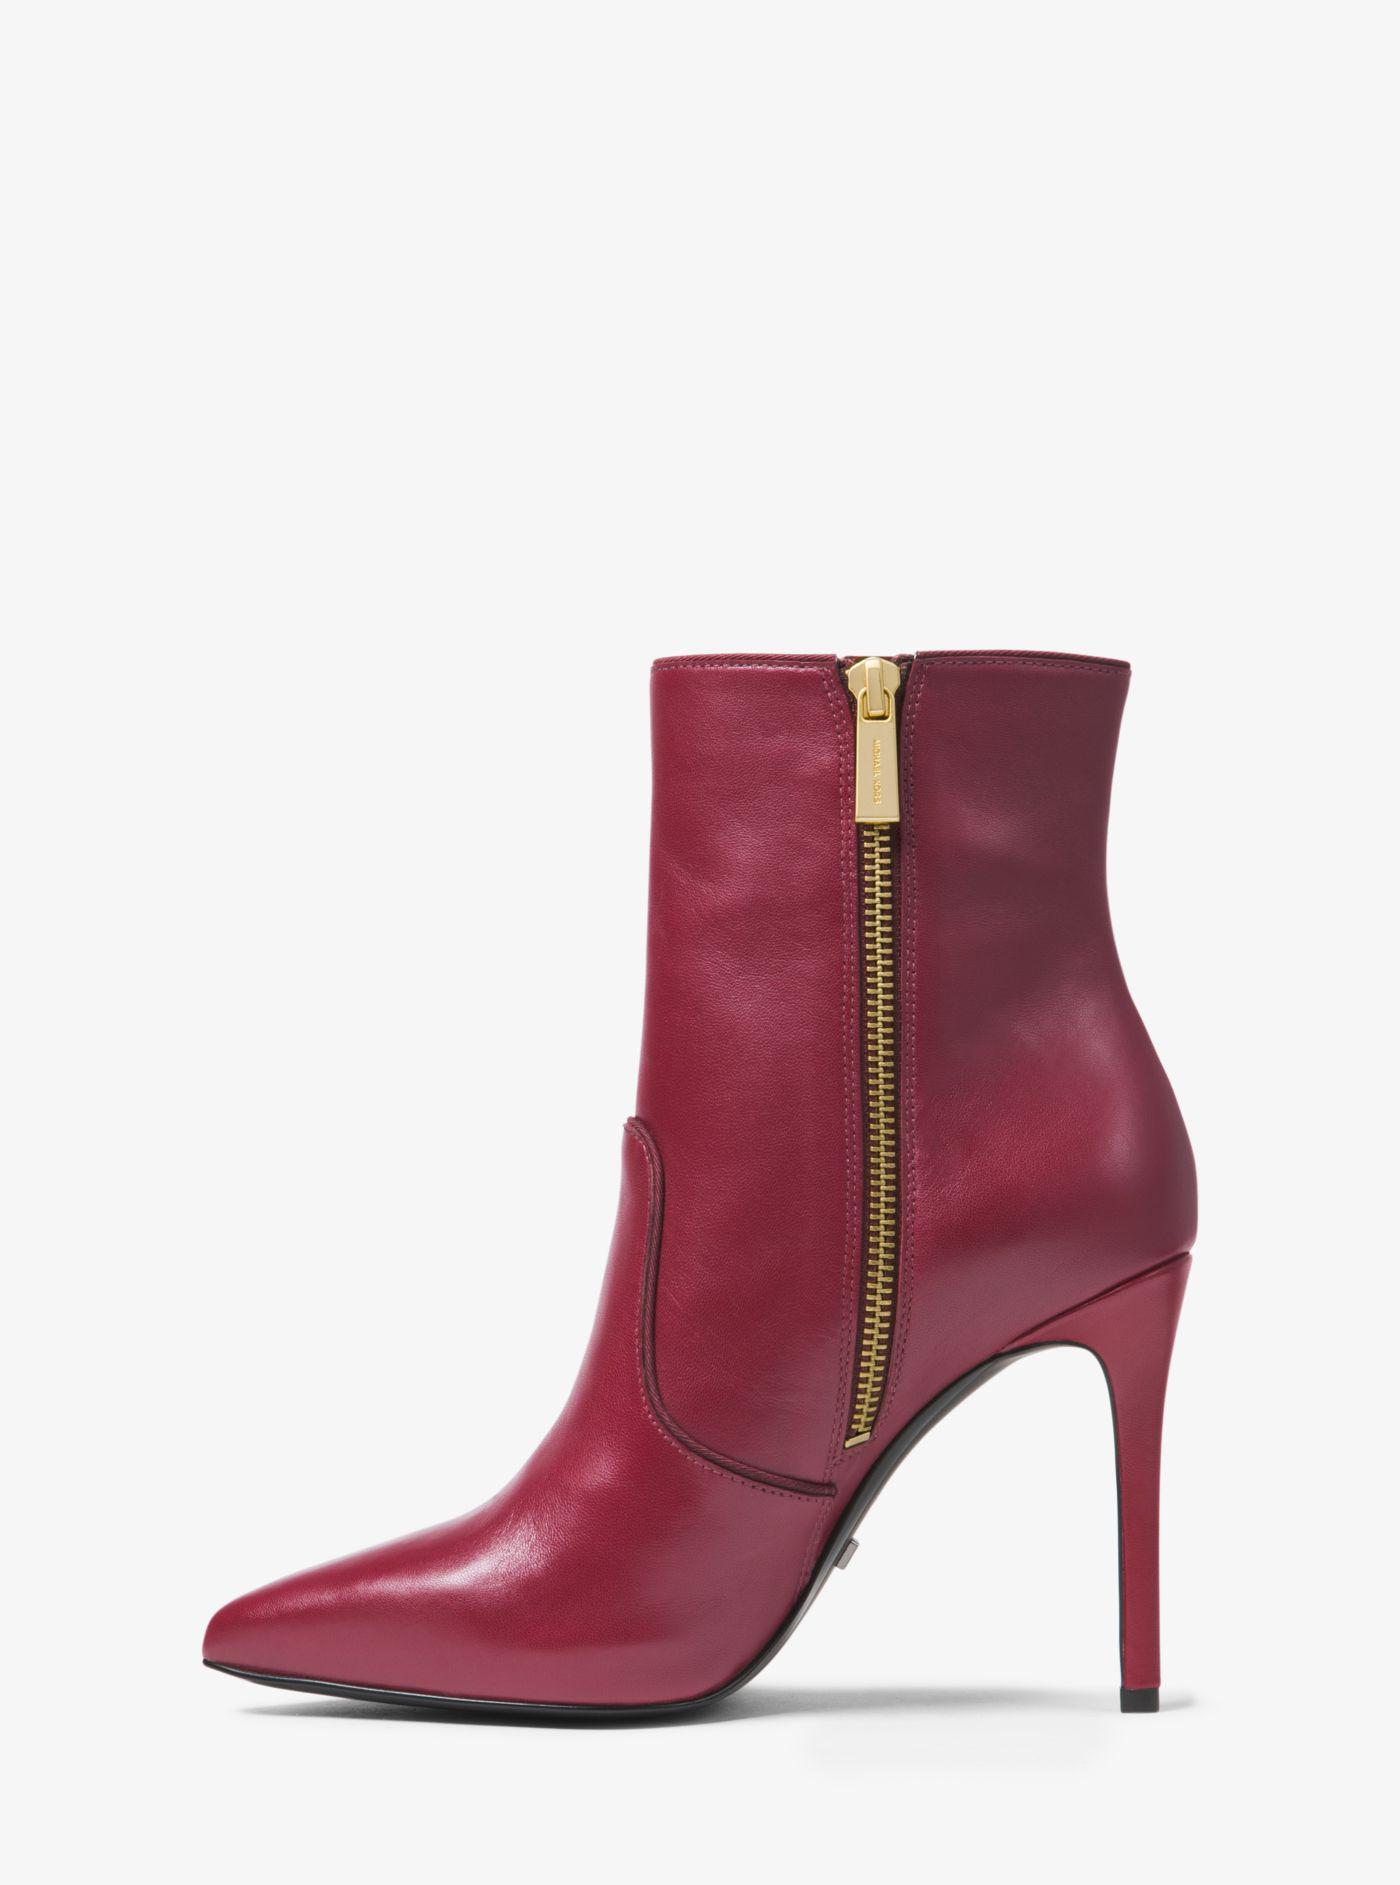 Michael Kors Blaine Leather Ankle Boot